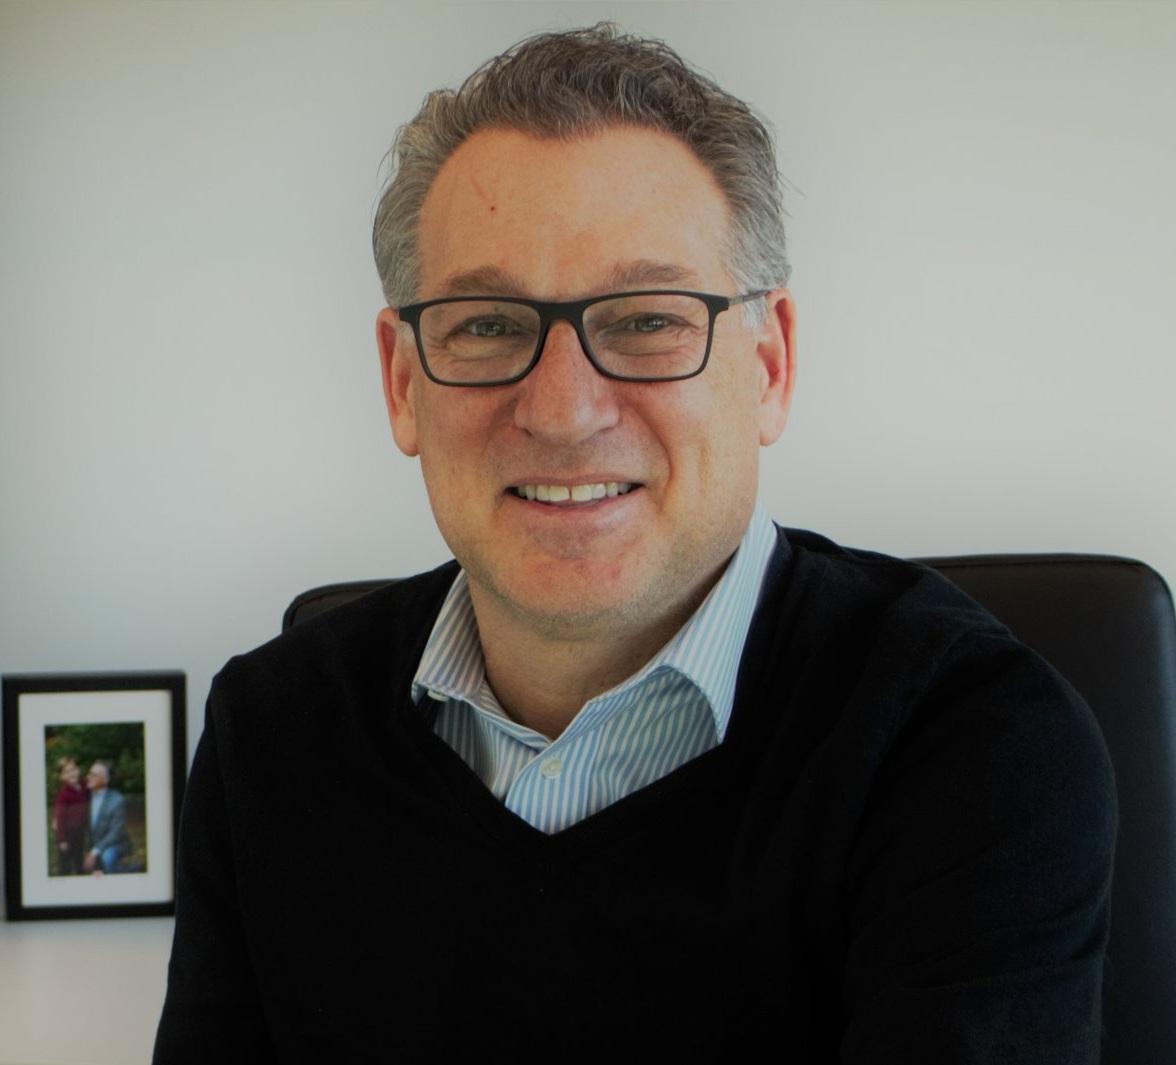 Mike Kalen # Covr Financial Technologies